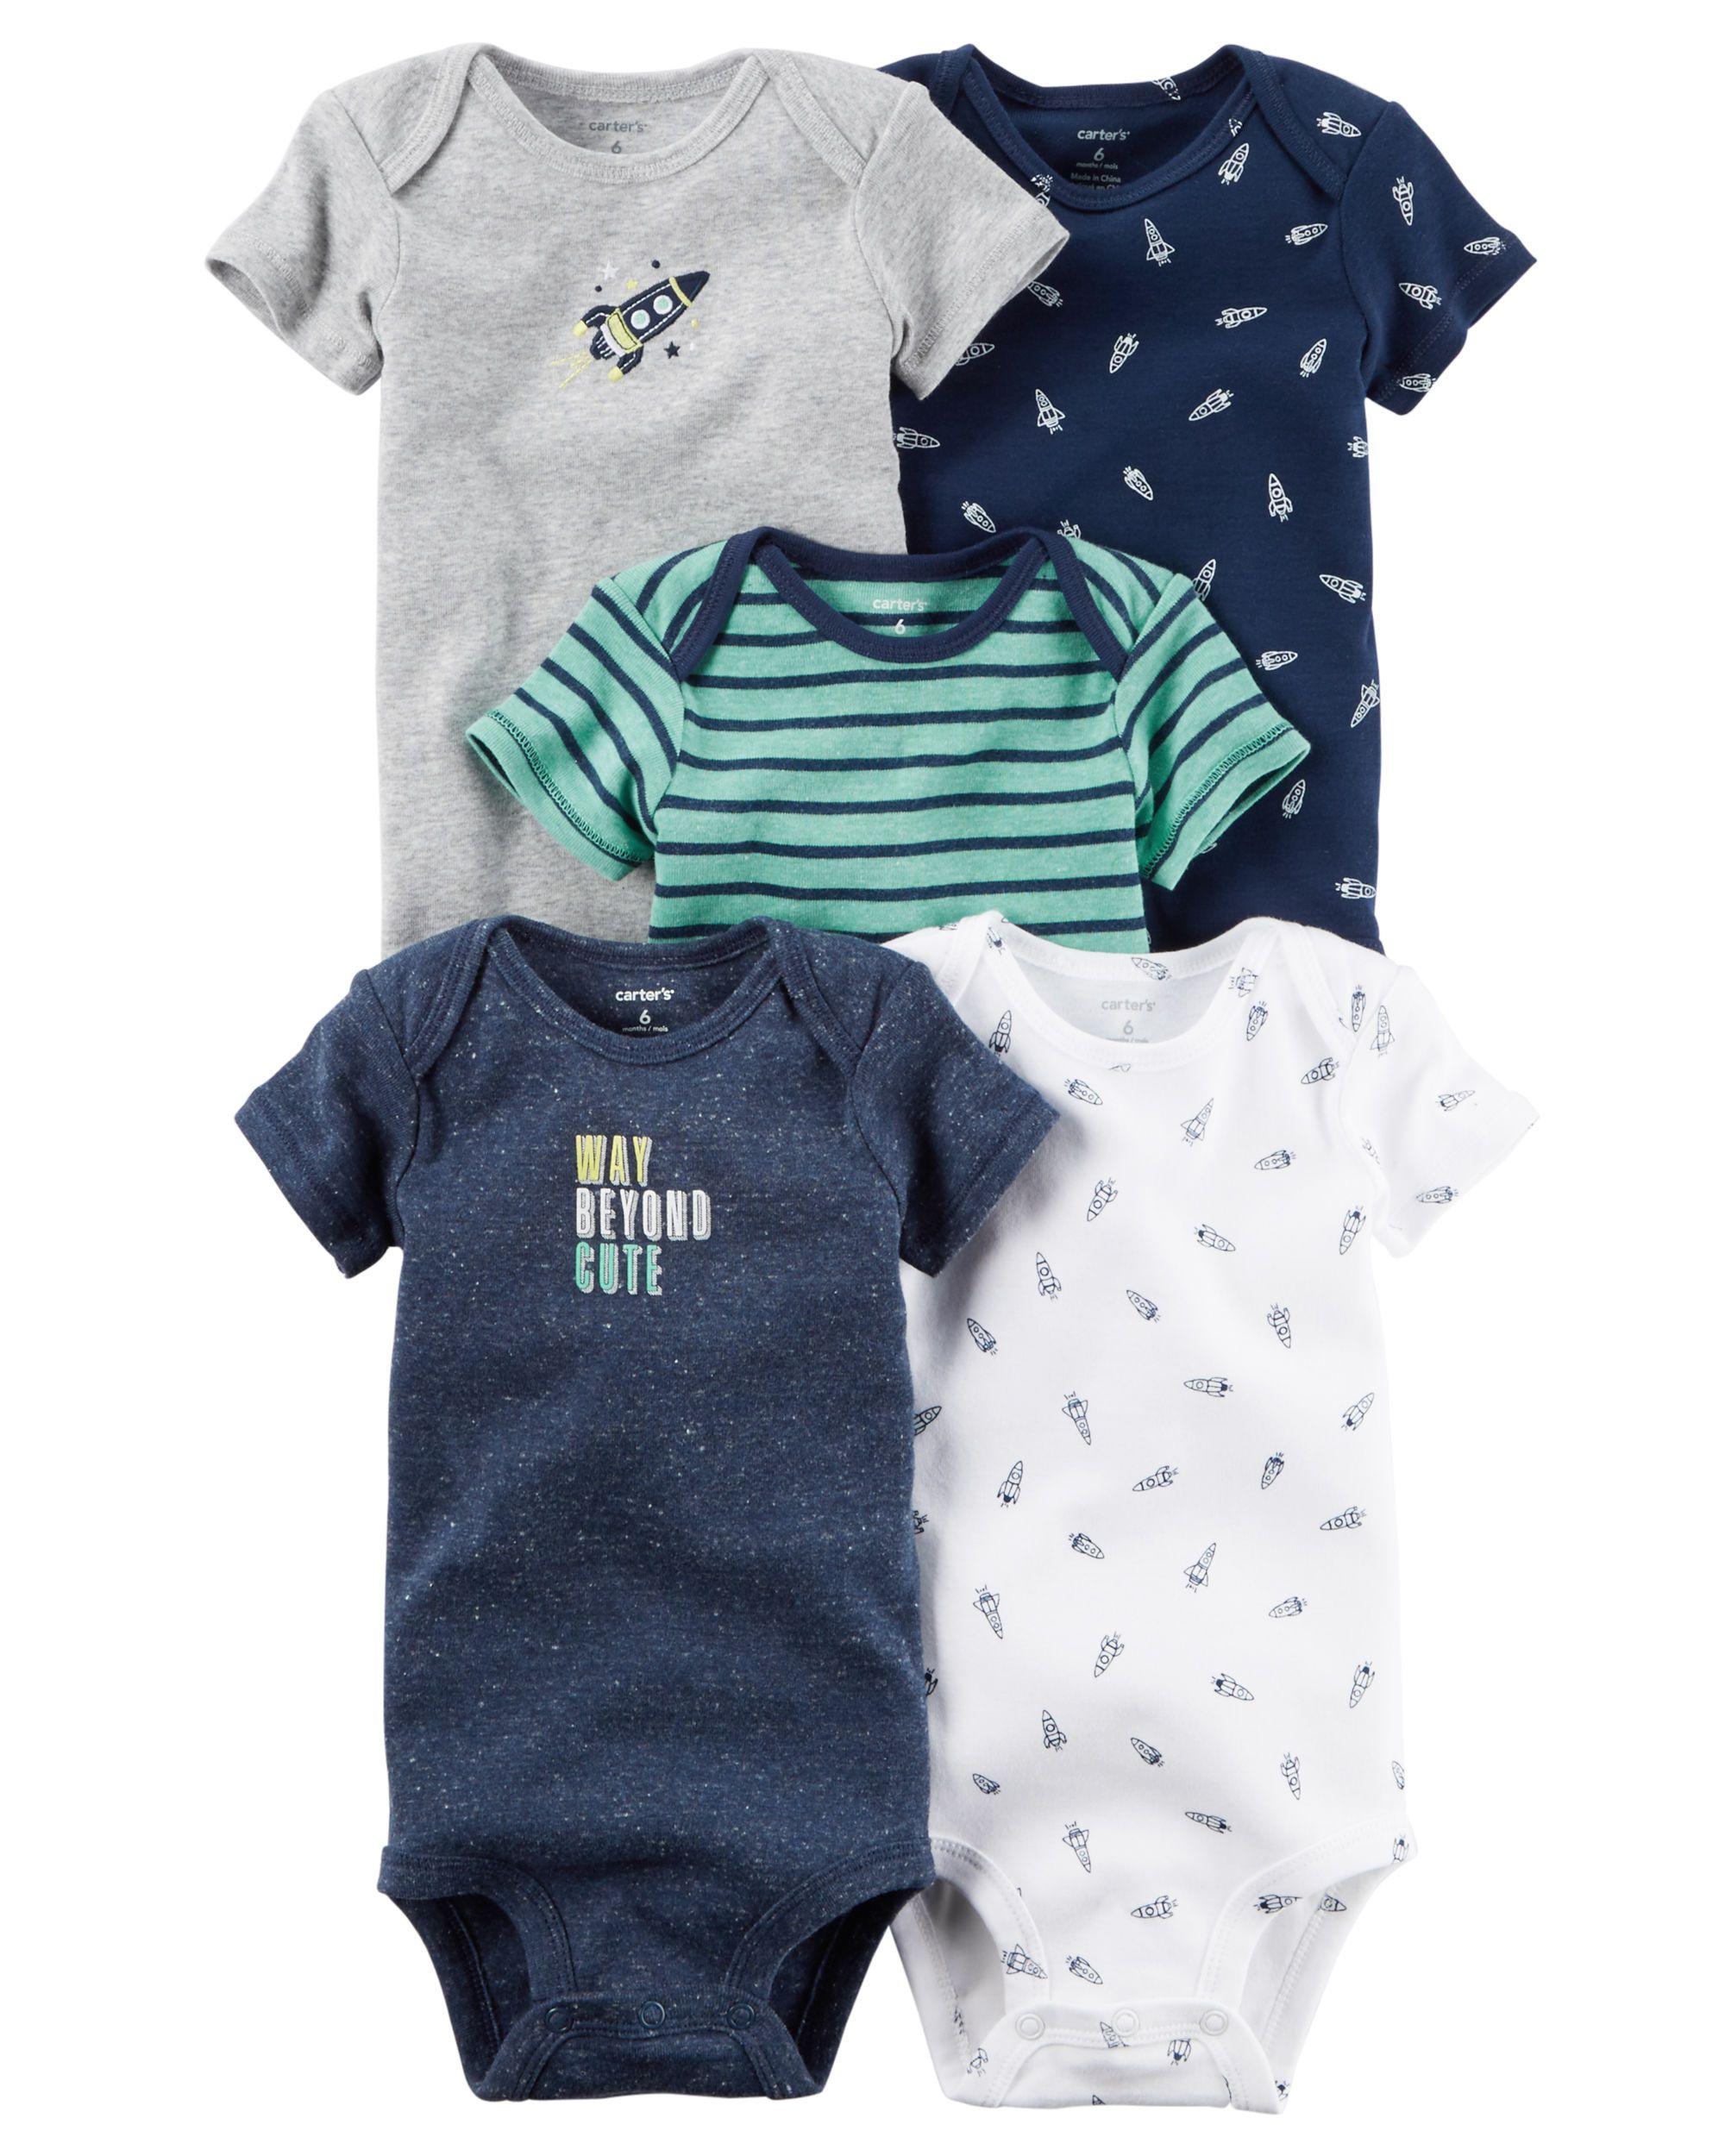 5 Pack Short Sleeve Bodysuits 2018 Spring Summer Trends